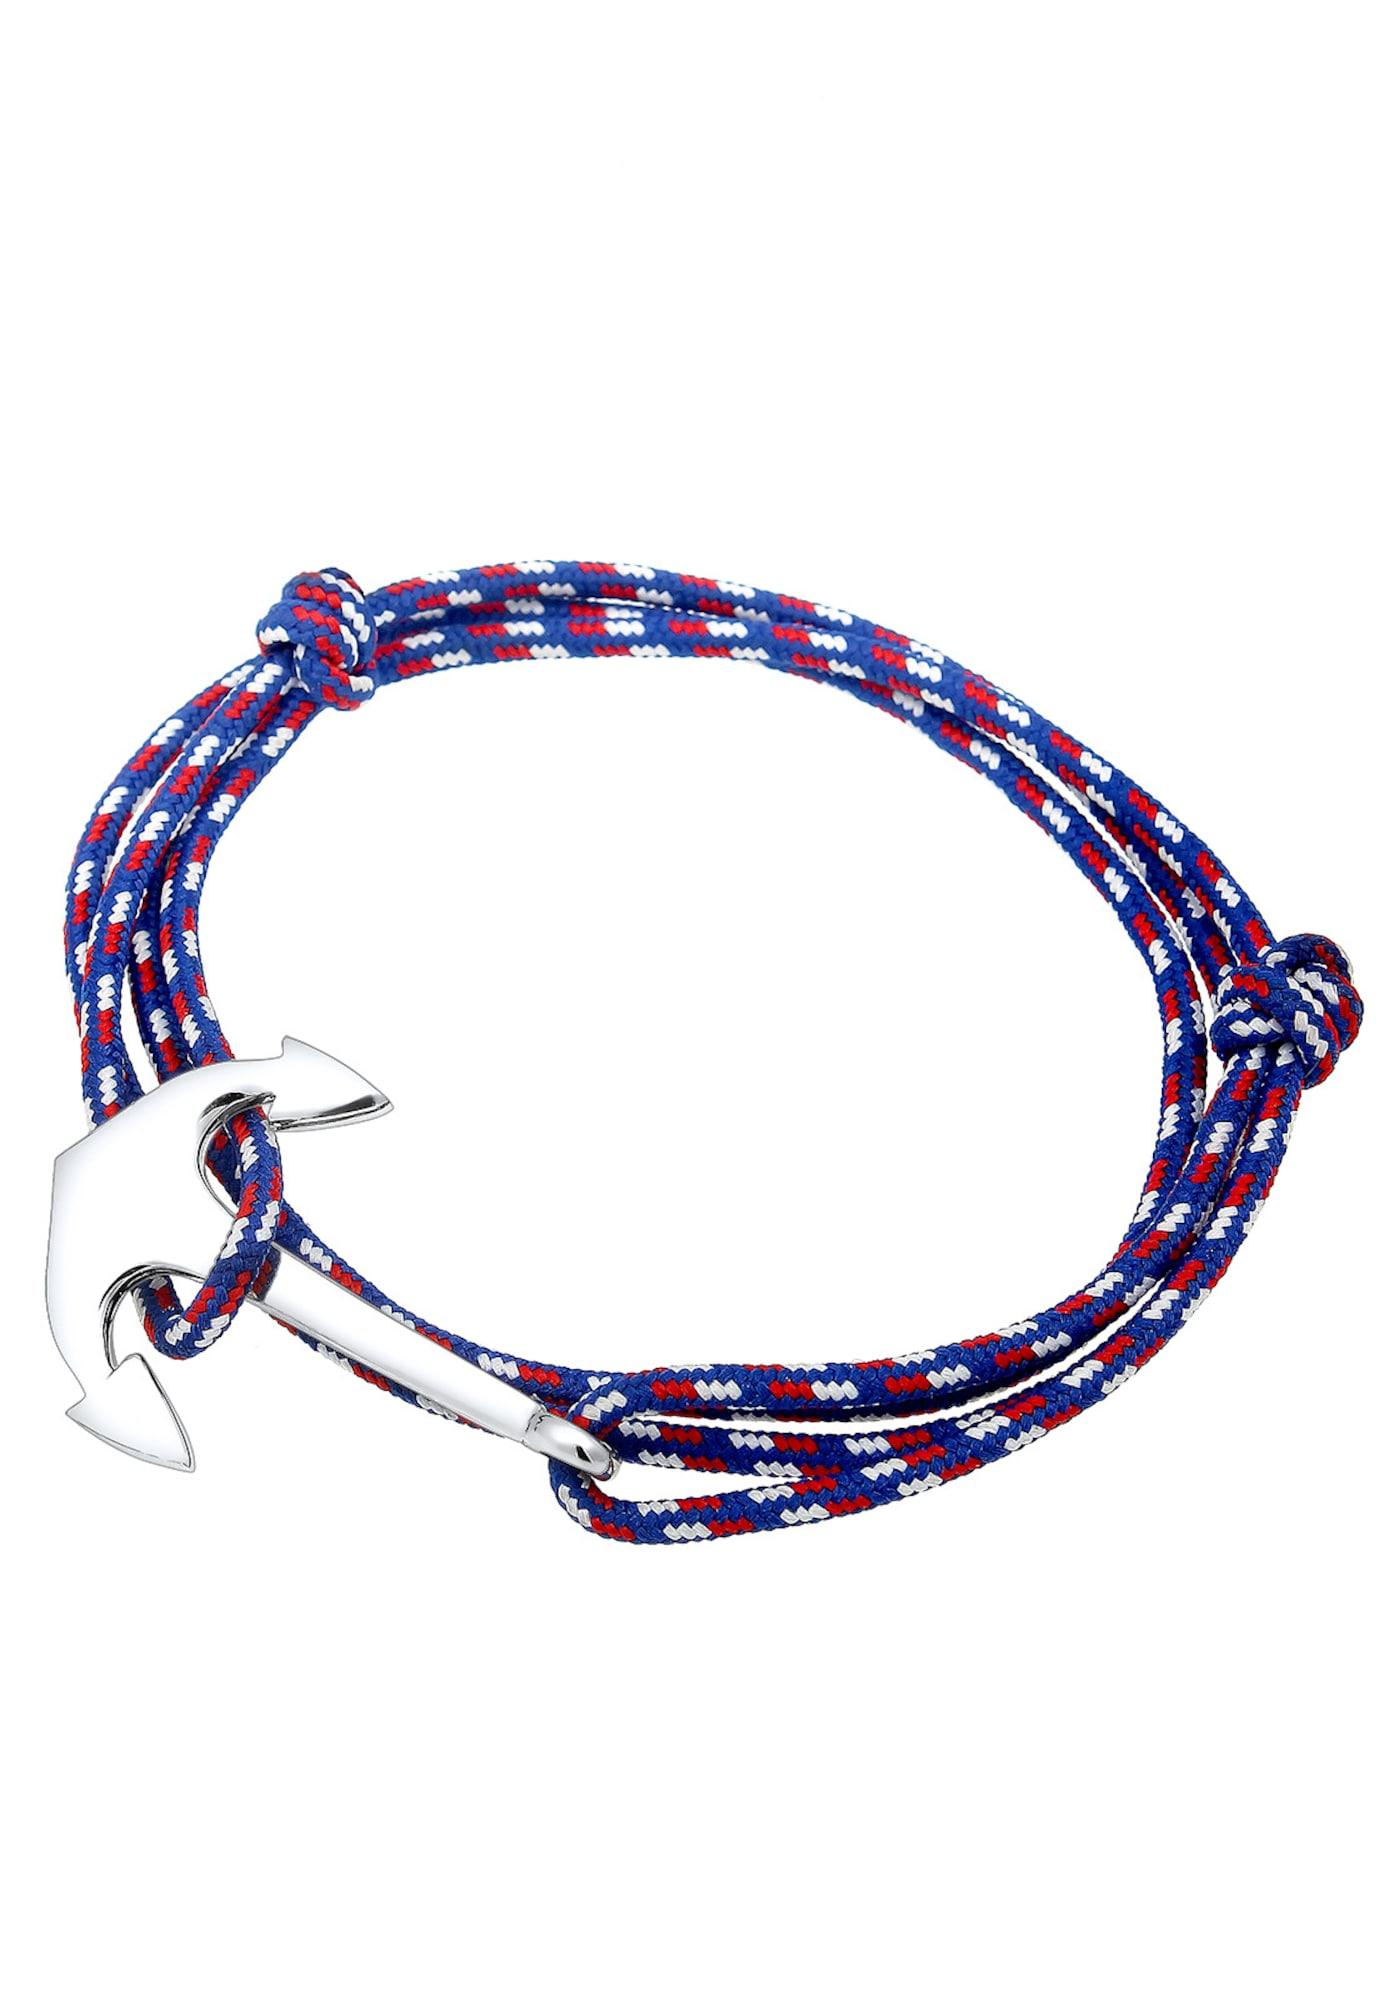 paulo fanello - Armband